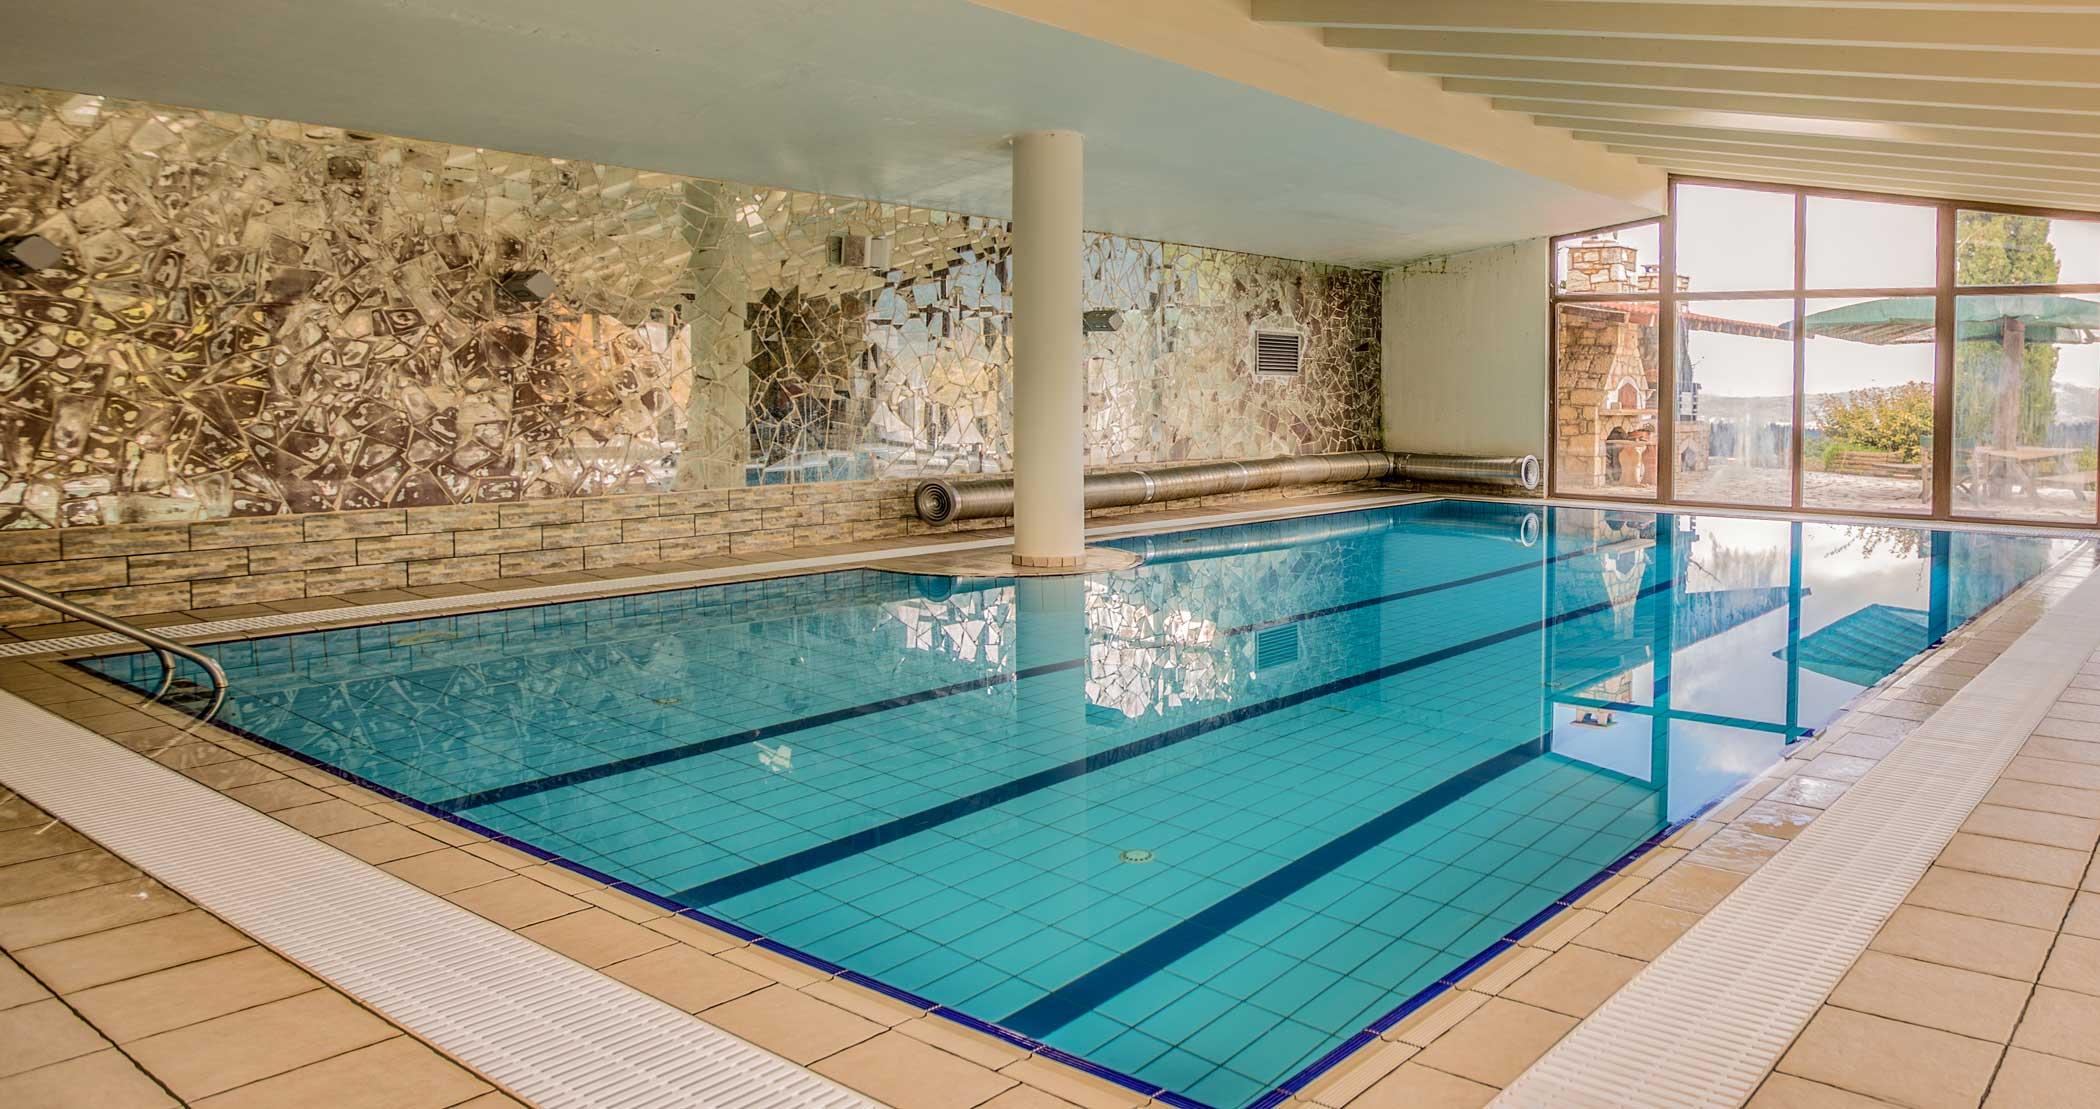 Skamnos Boutique Hotel indoor pool